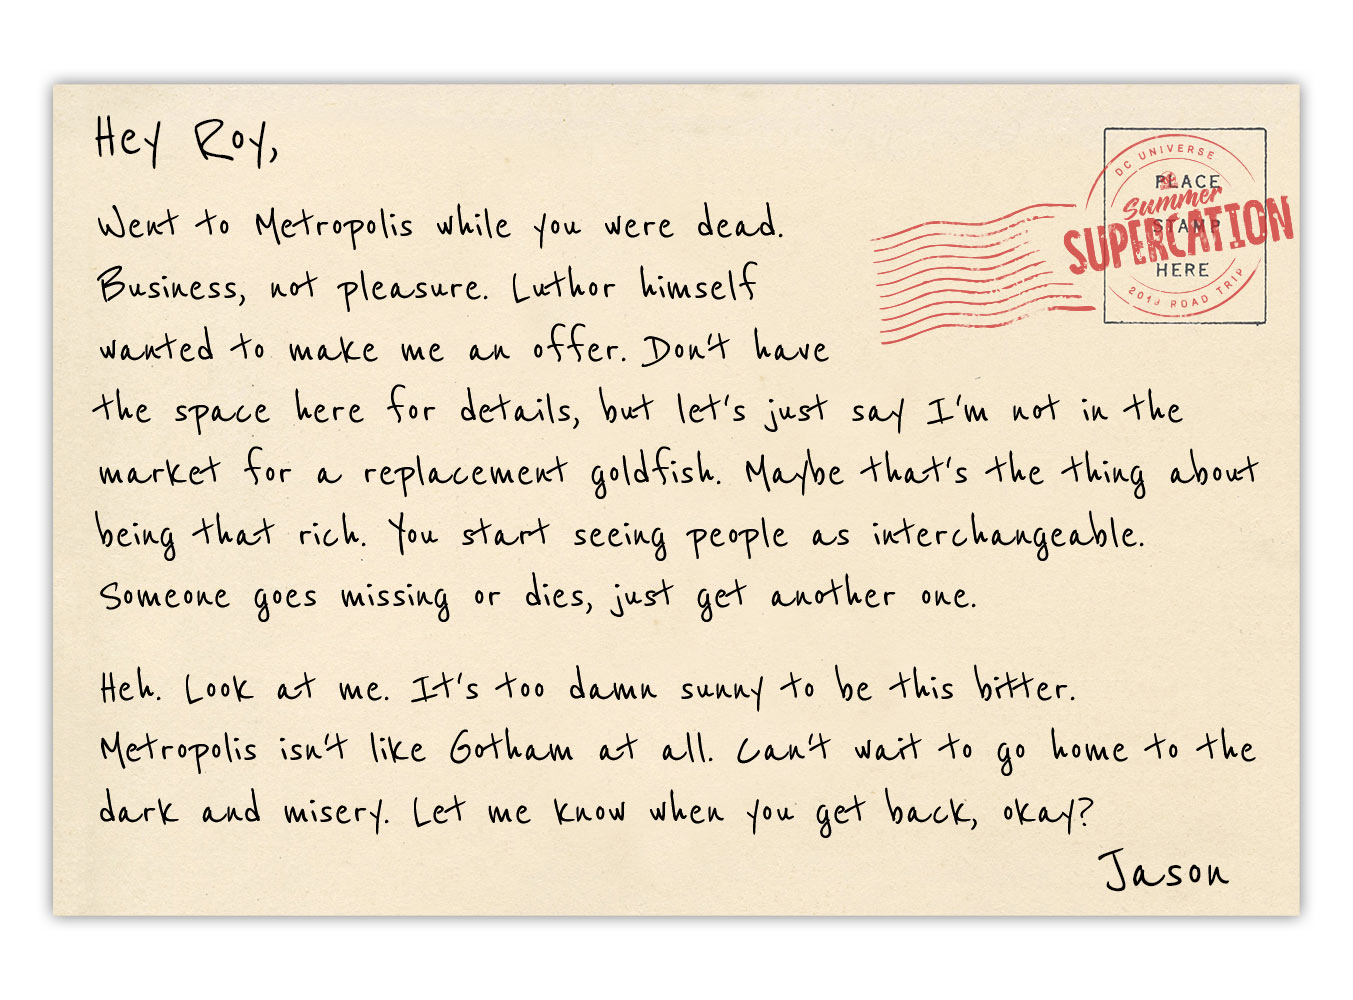 metropolis_postcards_190624_v2.jpg